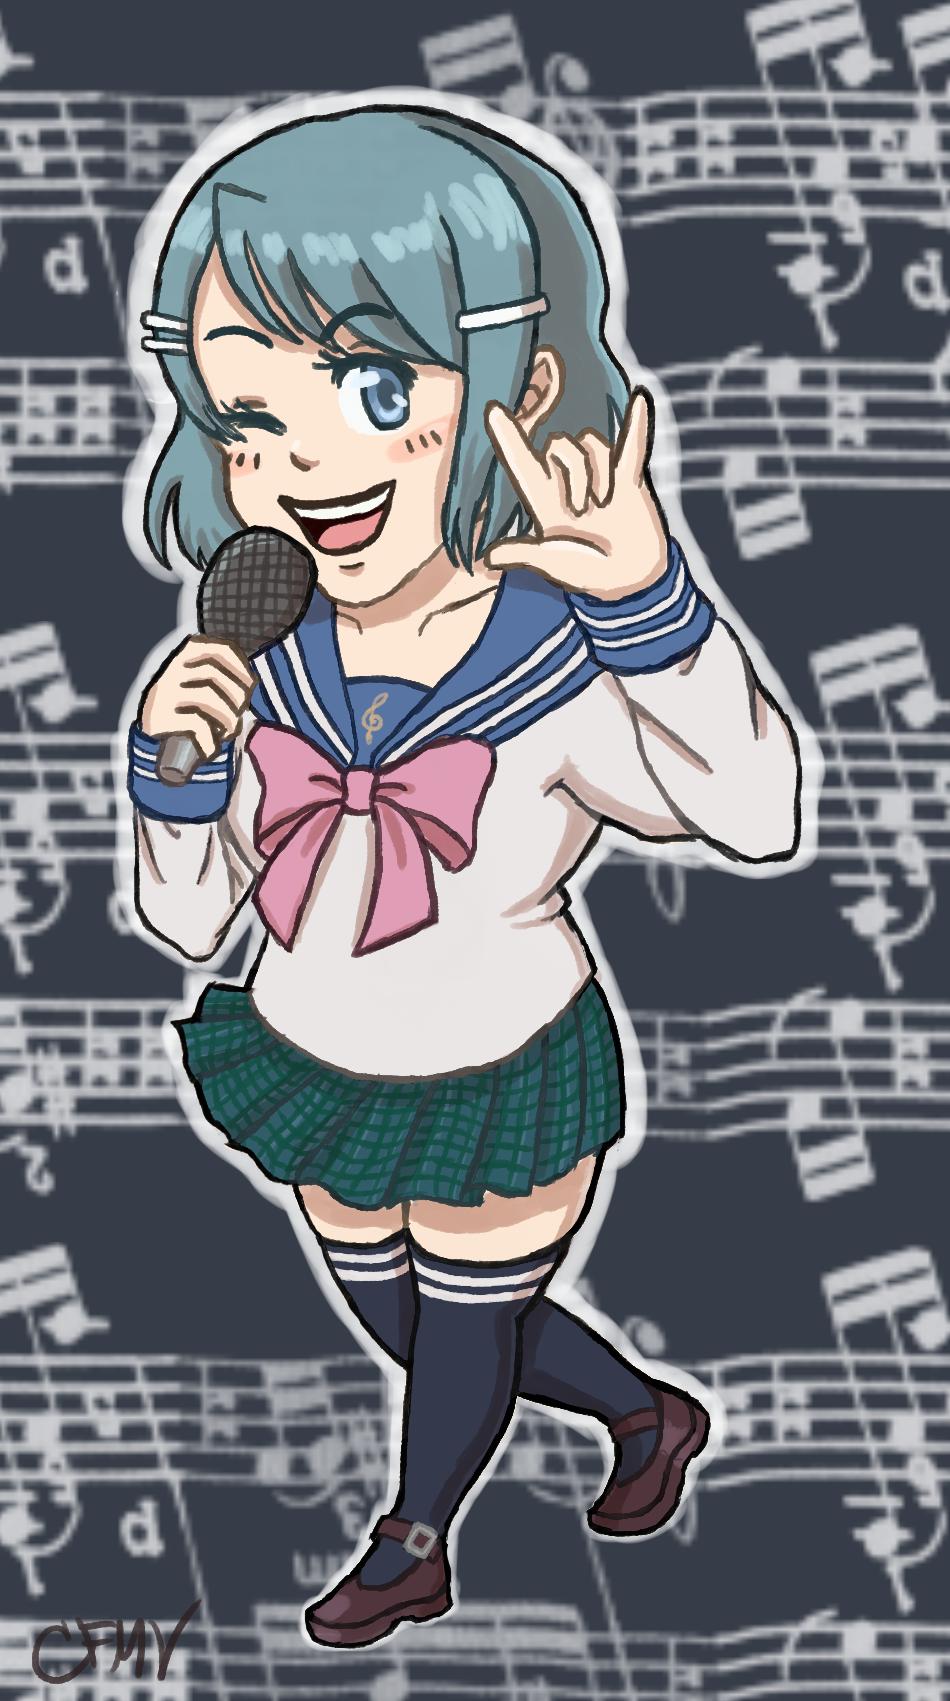 (old art) Sayaka as Sayaka